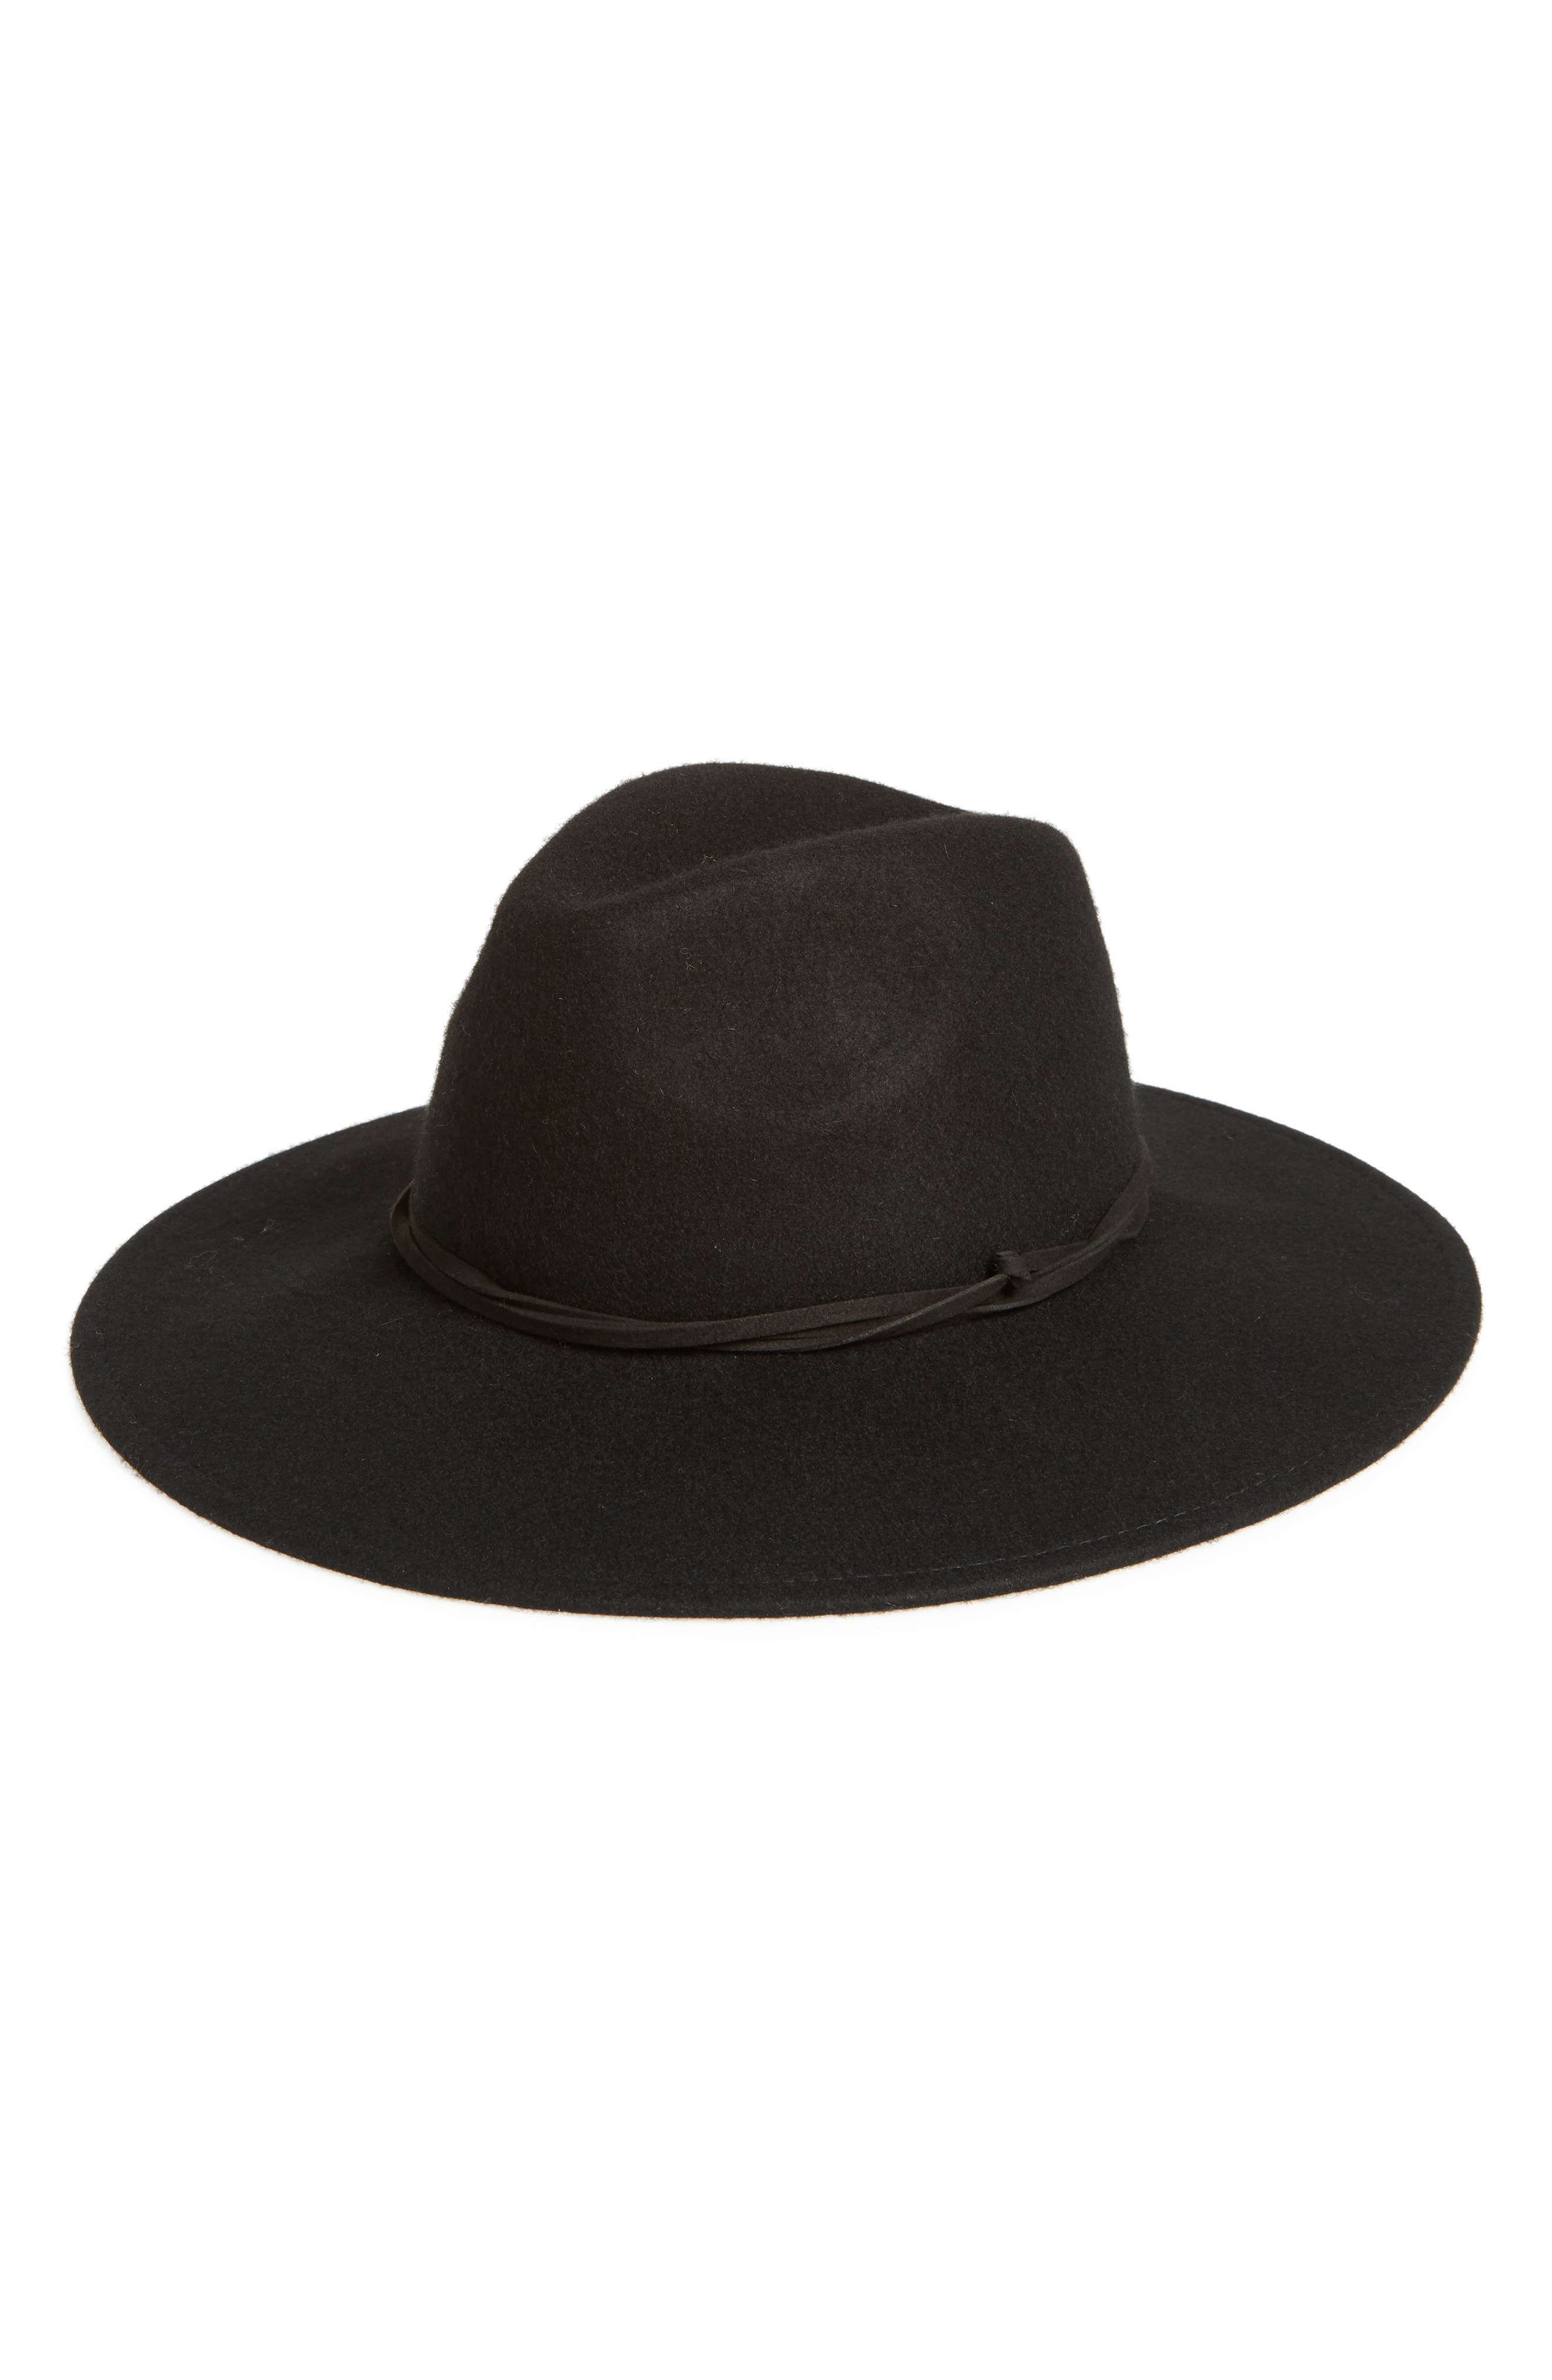 Felt Panama Hat,                         Main,                         color, 001